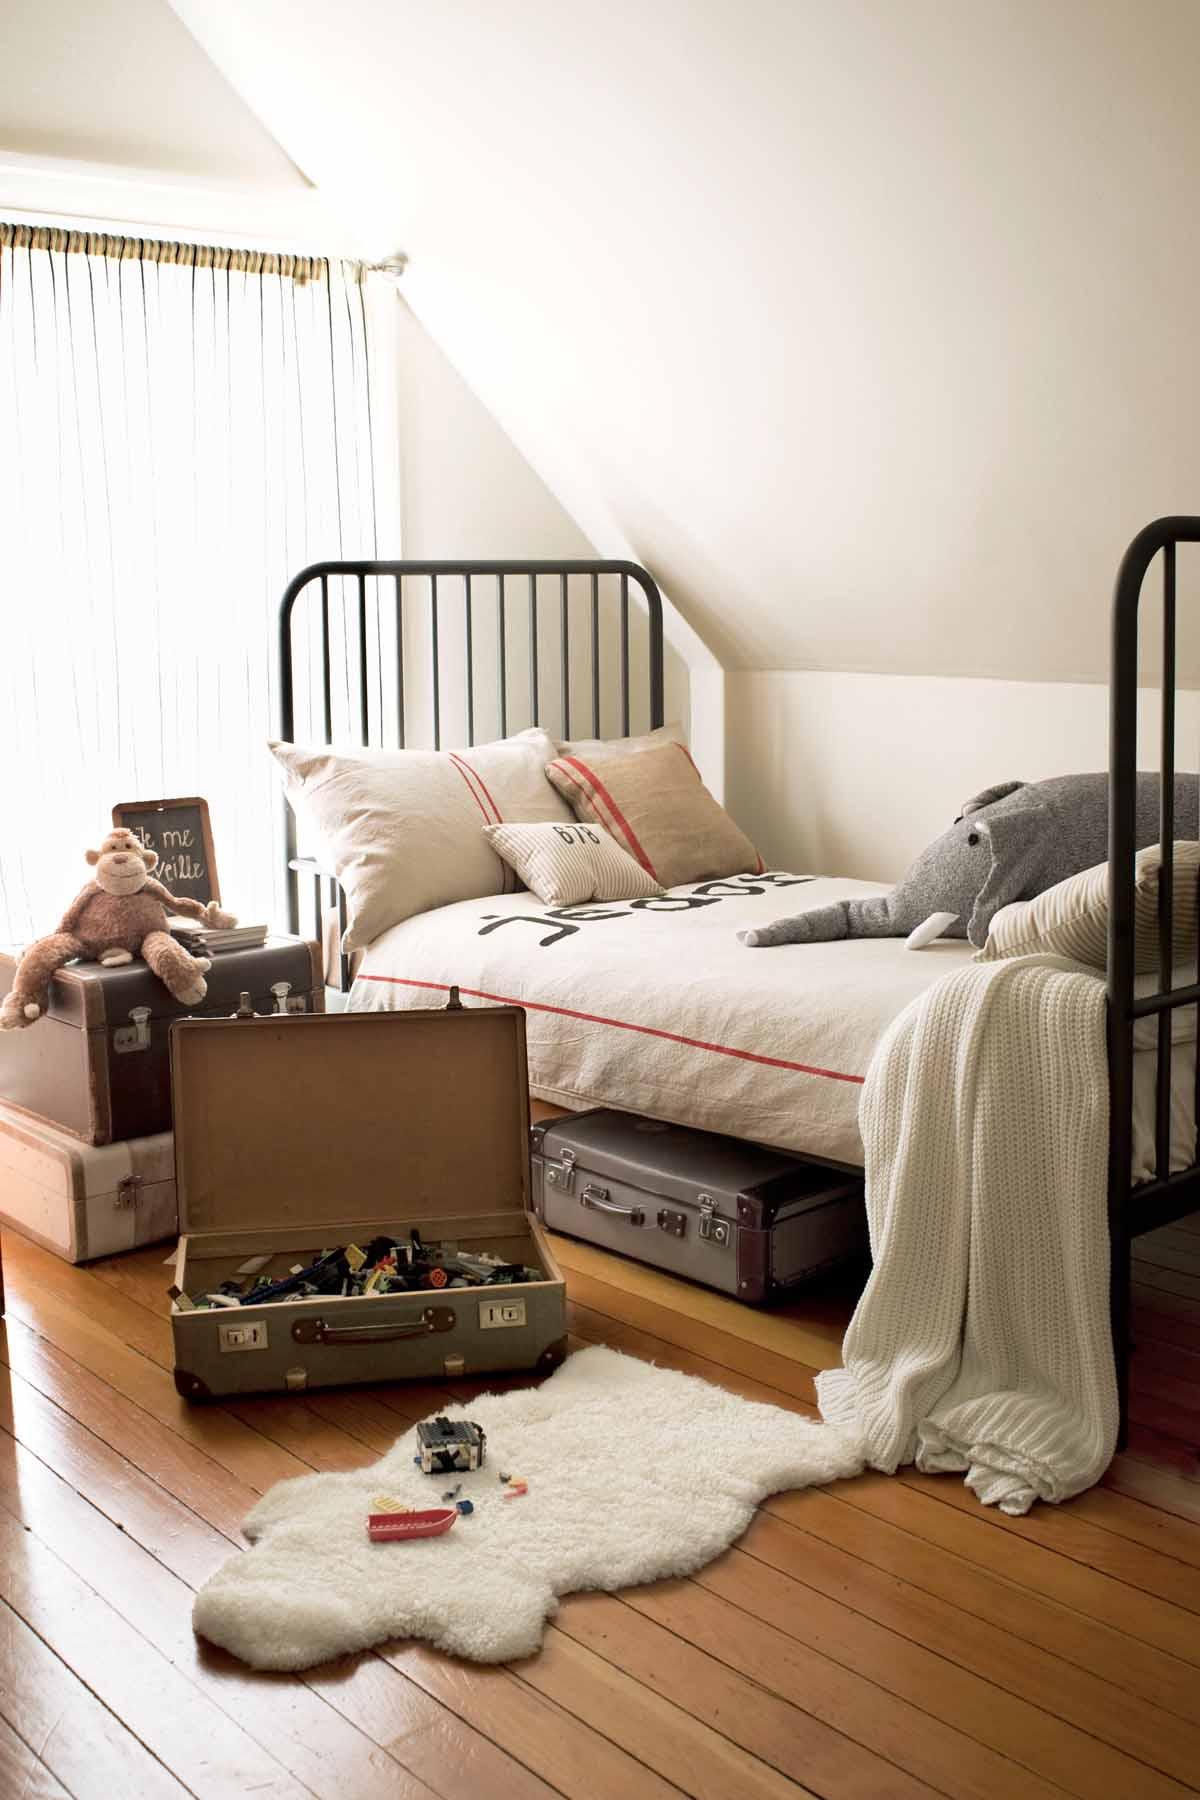 14 Best Boys Bedroom Ideas - Room Decor and Themes for a ... on Guys Bedroom Ideas  id=90126